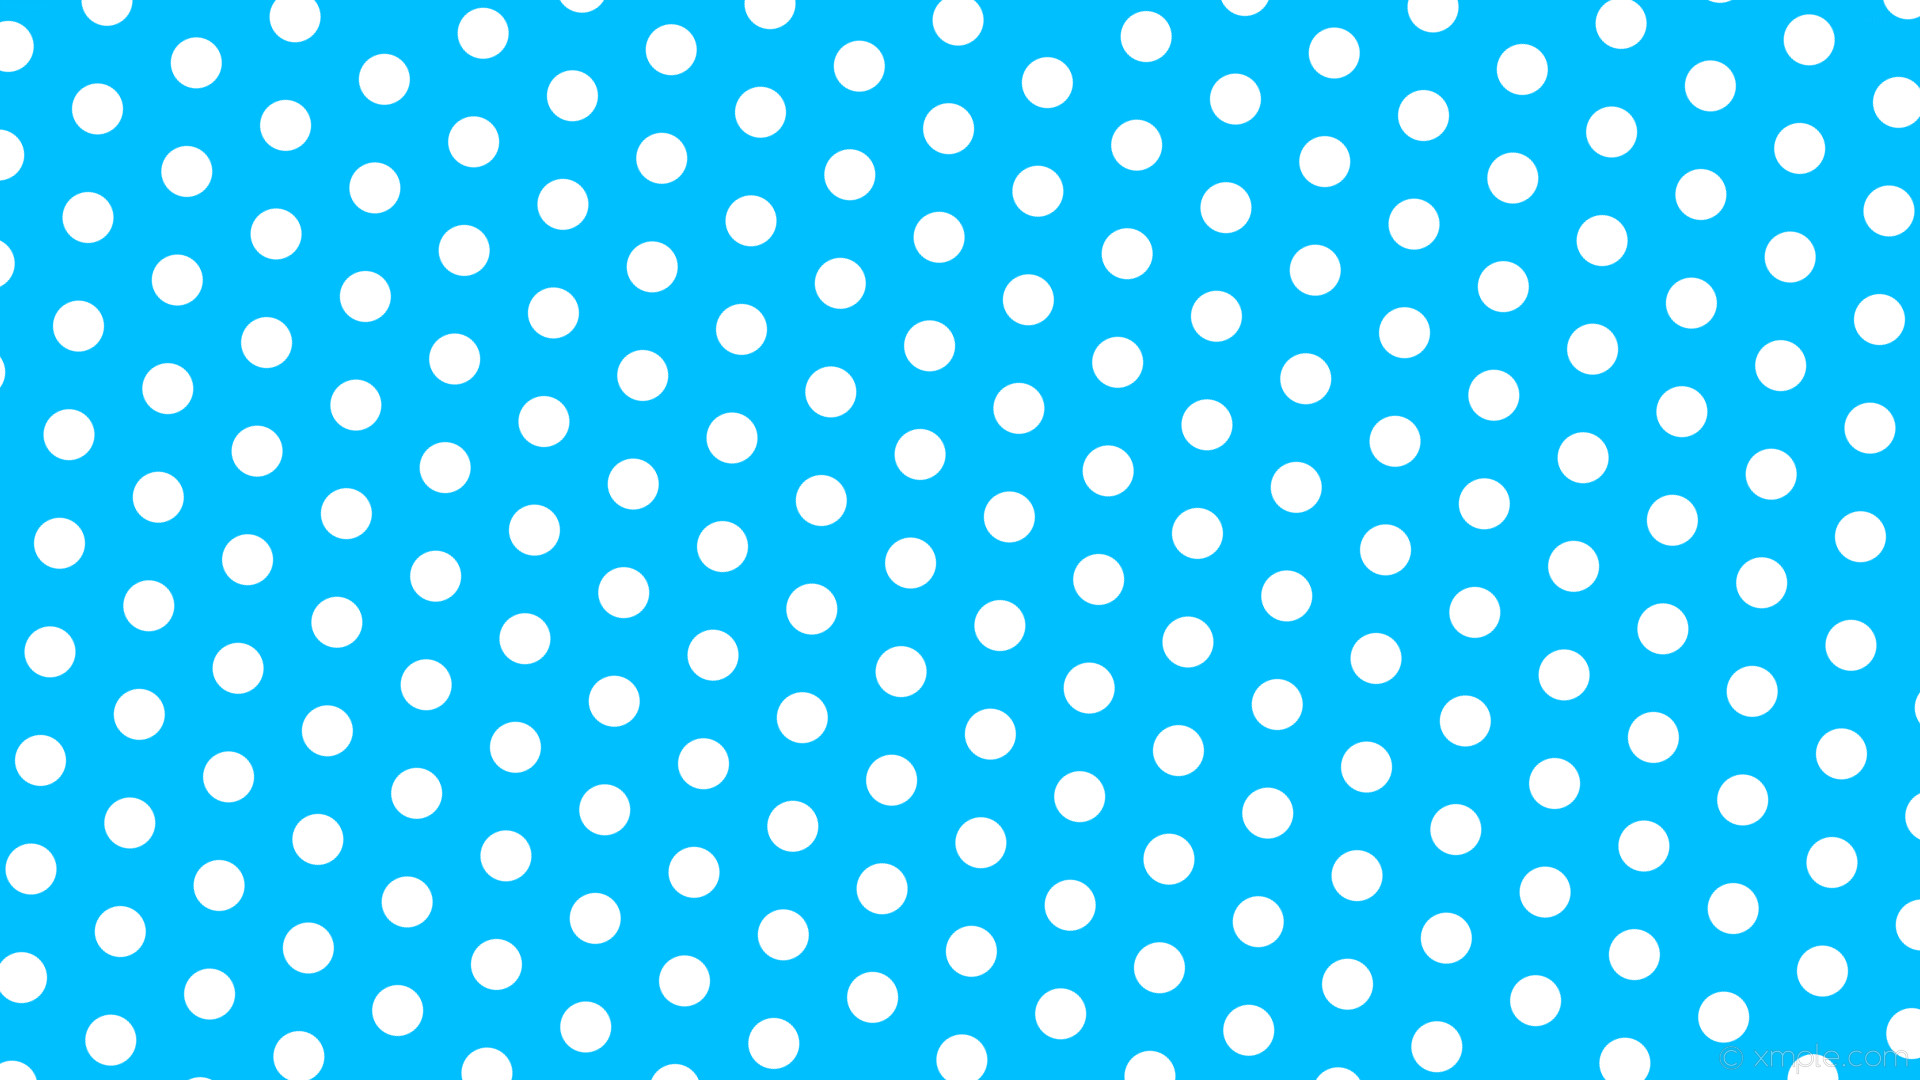 Blue Hexagon Wallpaper 83 Images